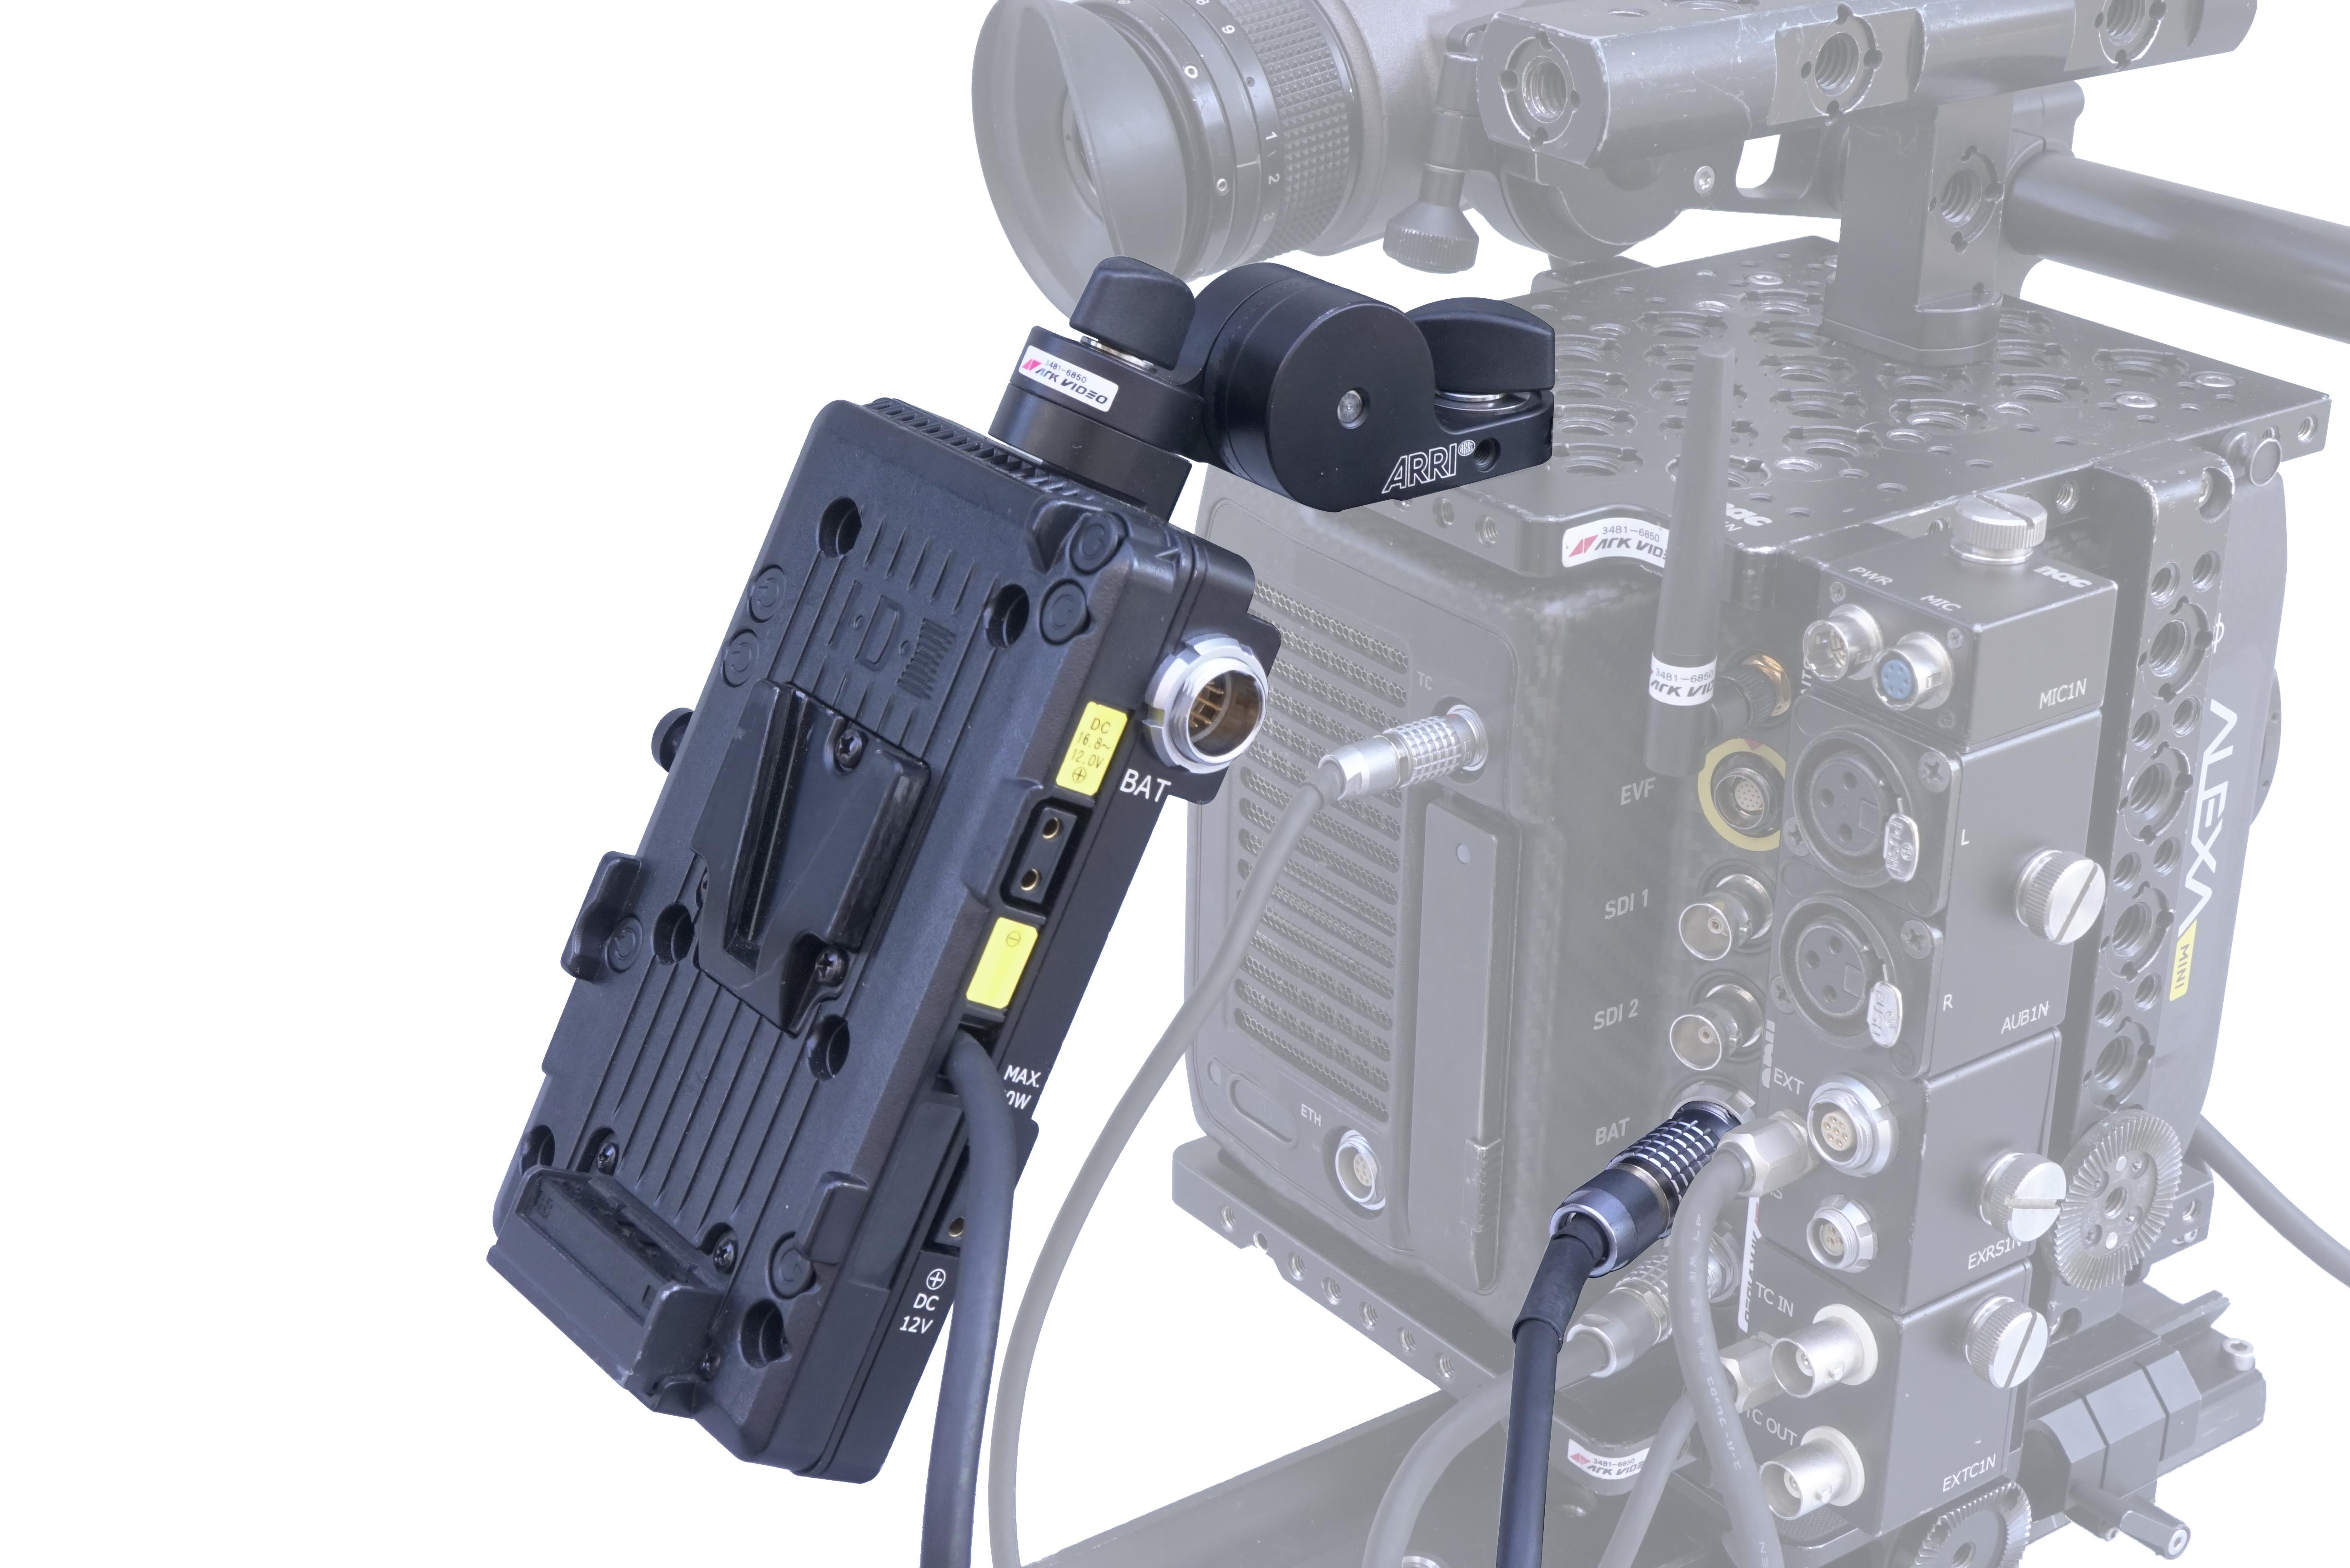 ALEXA Mini用 アジャスタブルVマウントバッテリープレート